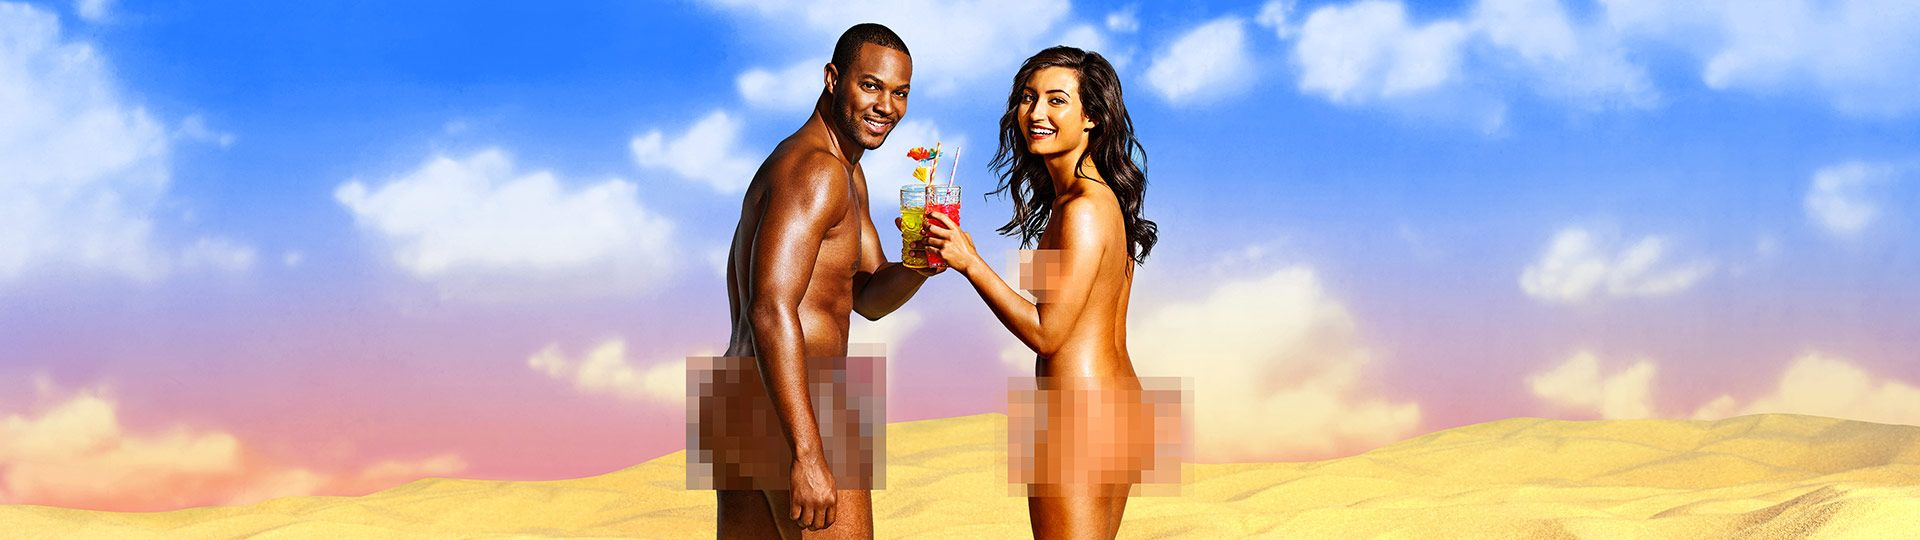 Nude fucking girls under